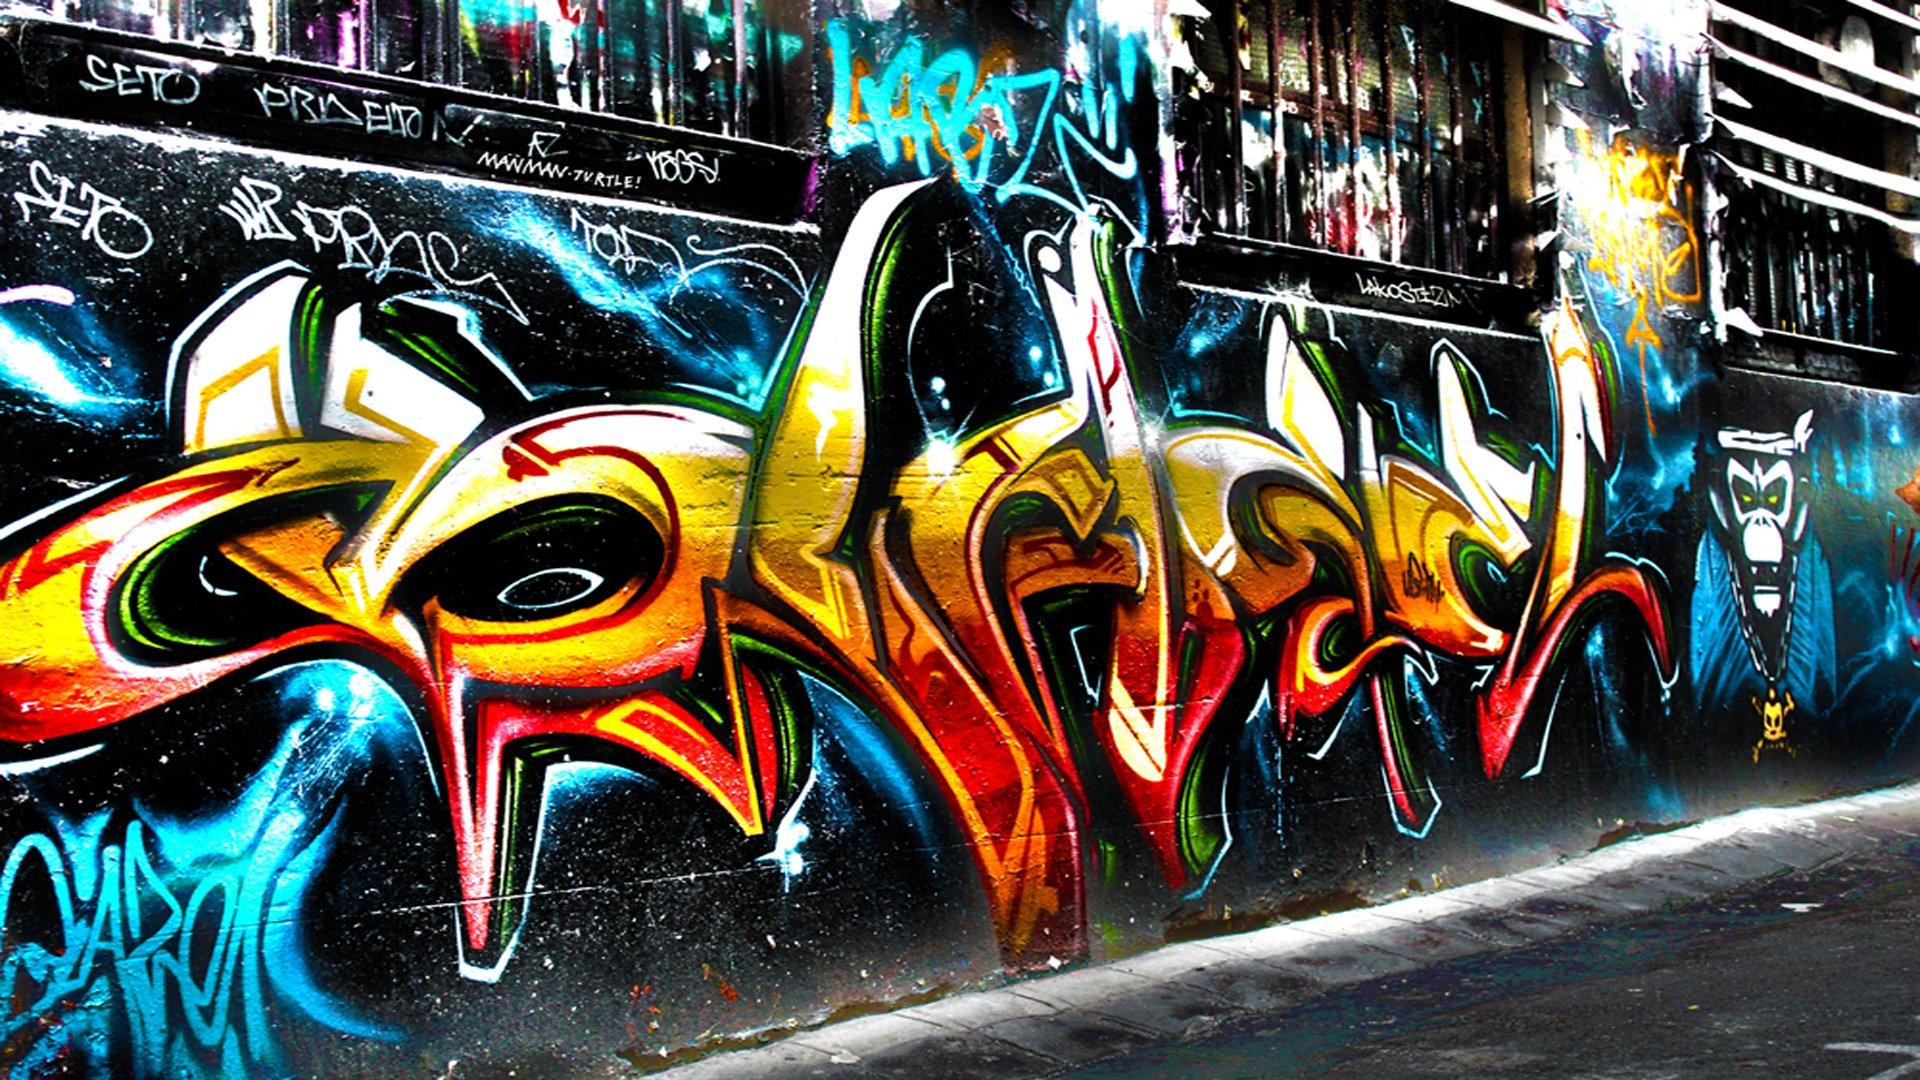 Artistic - Graffiti  Trippy Psychedelic Urban Urban Art Wallpaper